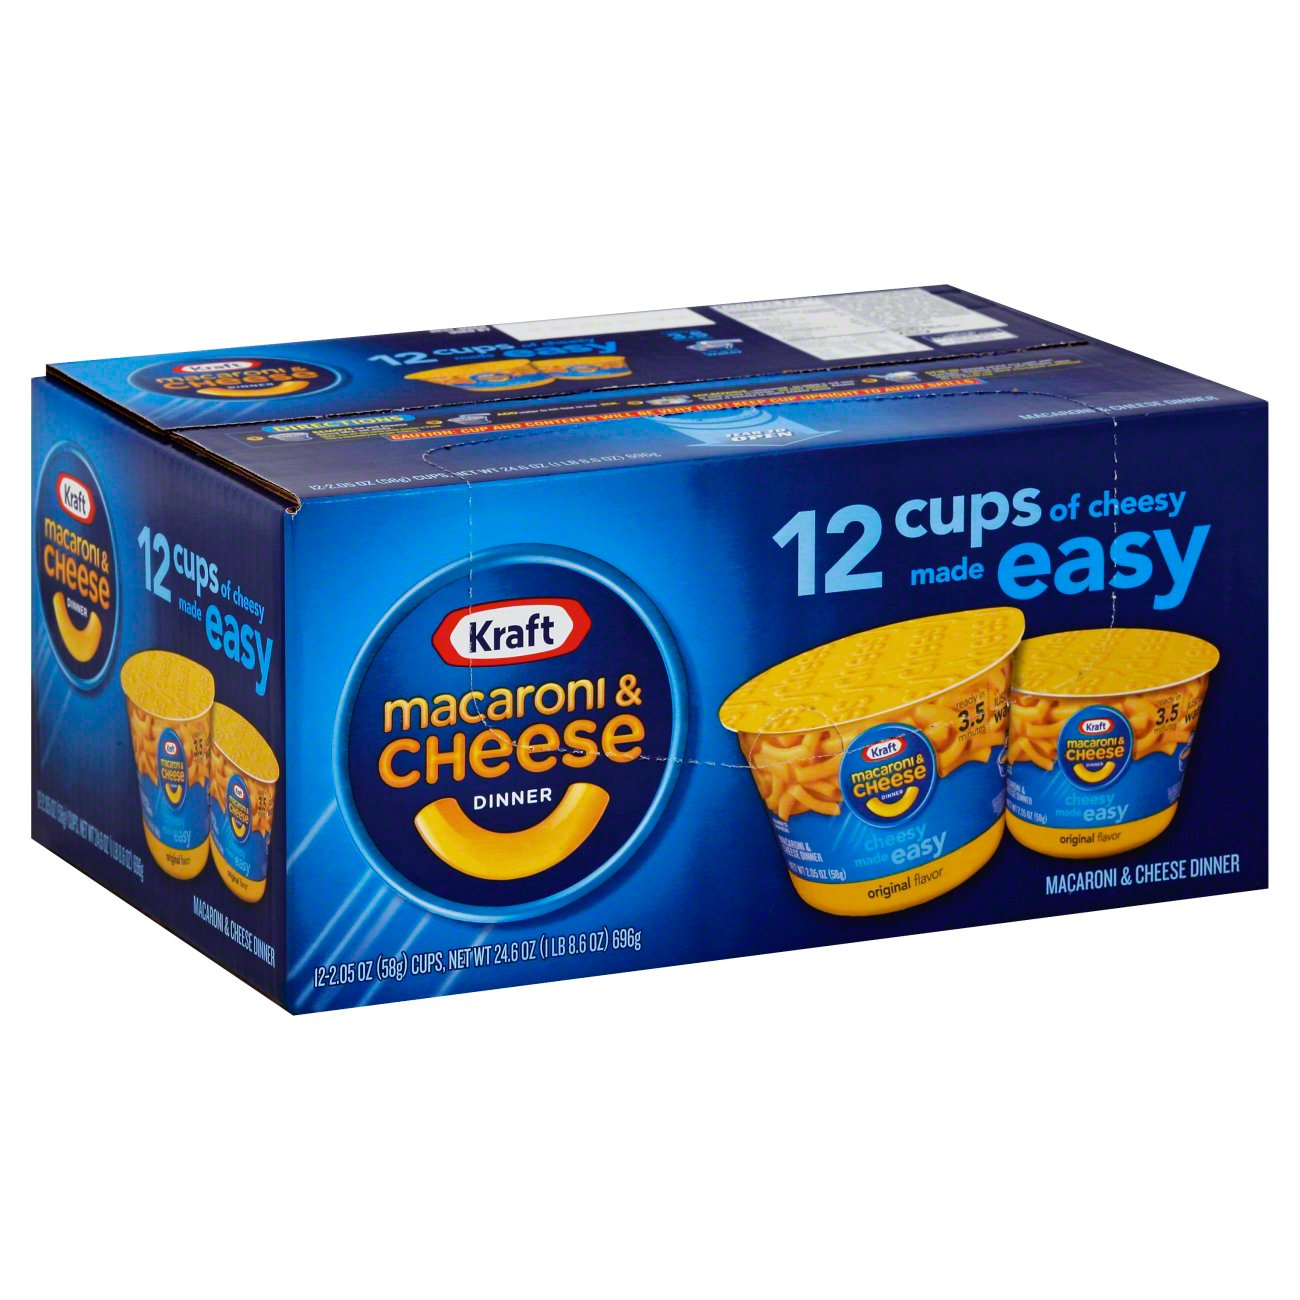 Kraft Easy Mac Original Macaroni